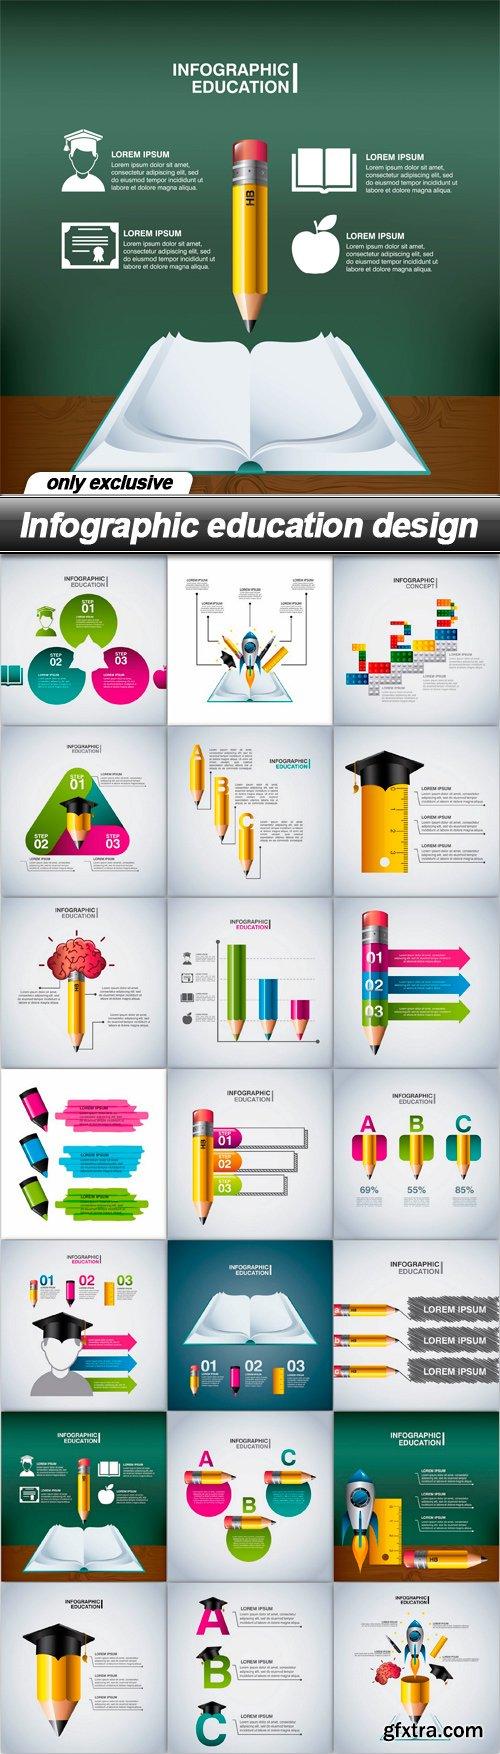 Infographic education design - 21 EPS